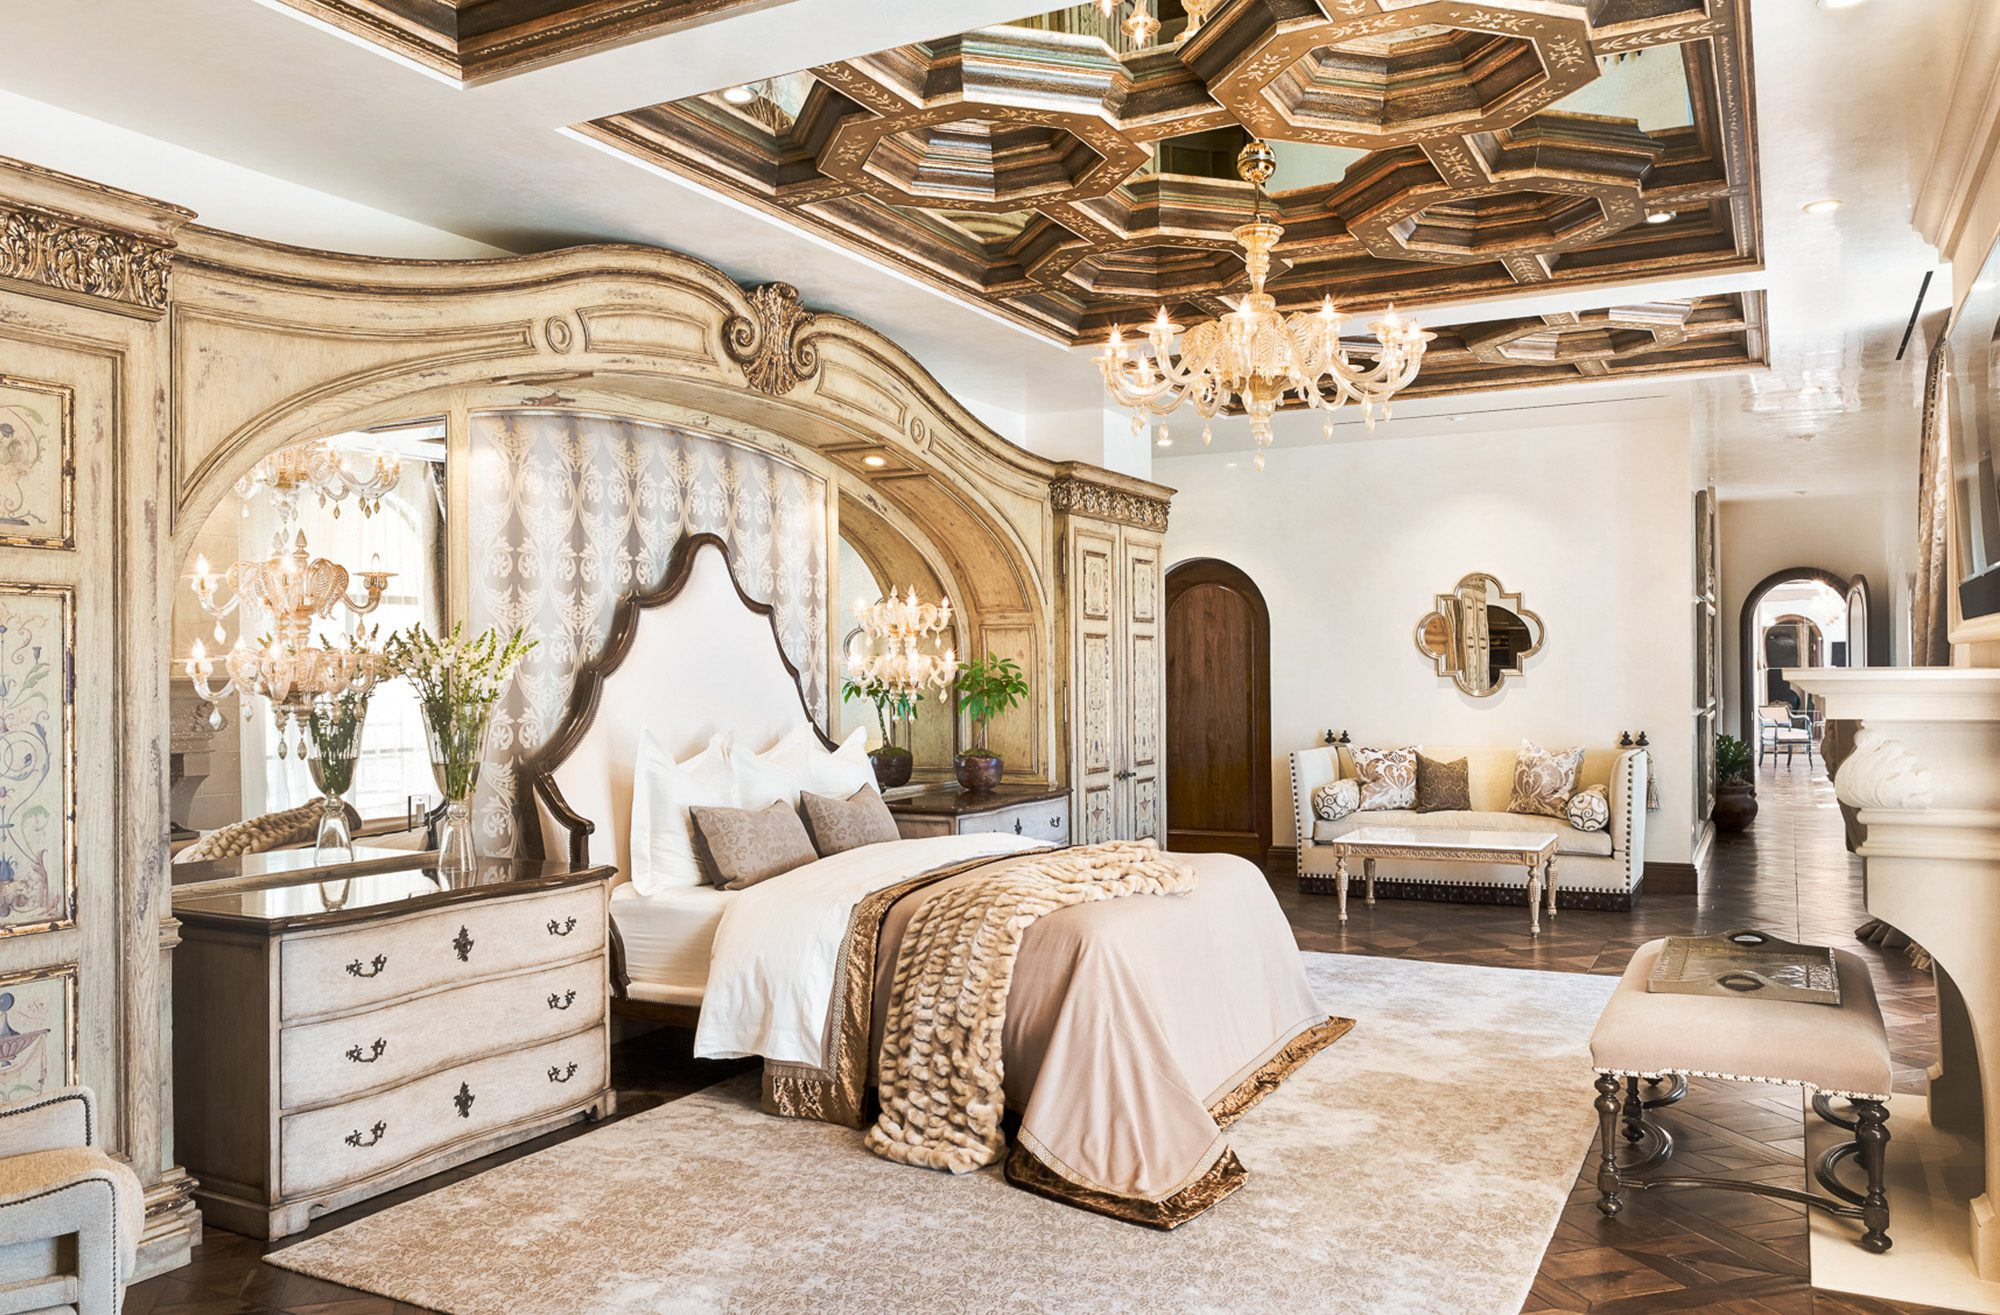 12-tara-dudley-interiors-renaissance-revival-master-suite-002-copy